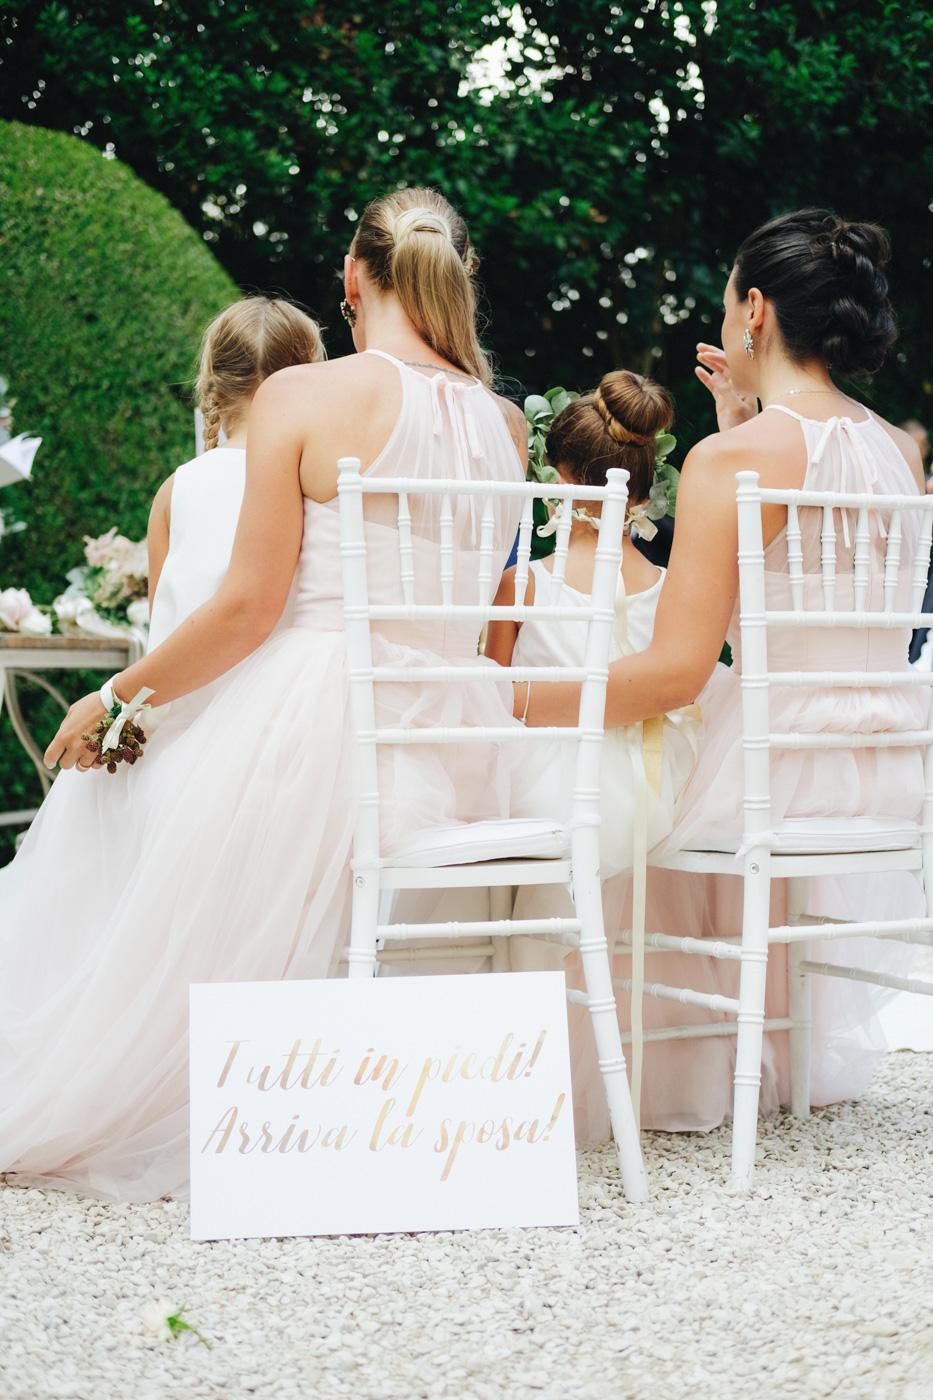 Matrimoni all'italiana wedding photographer italy-79.jpg